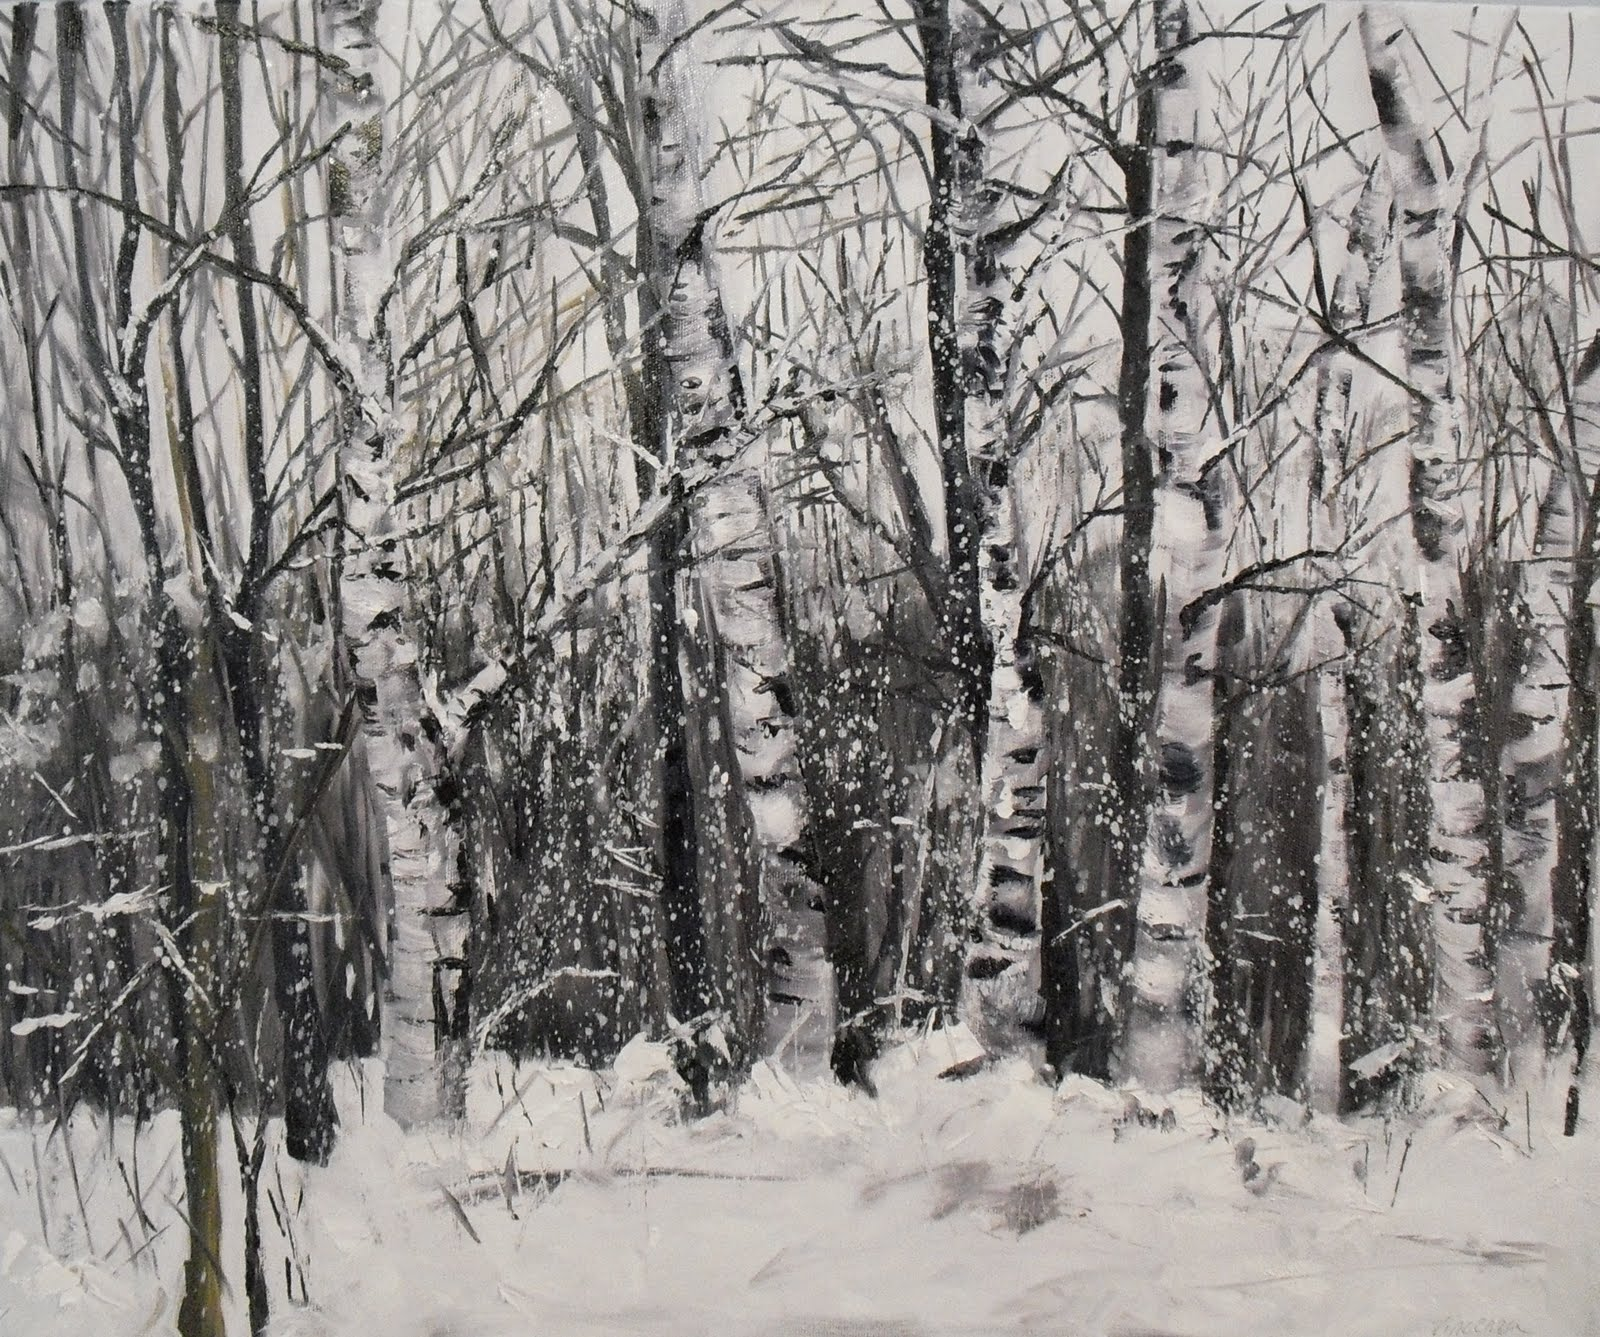 """Snowy Birch Trees~ 20x24~ oil on canvas"" original fine art by Vincenza Harrity"